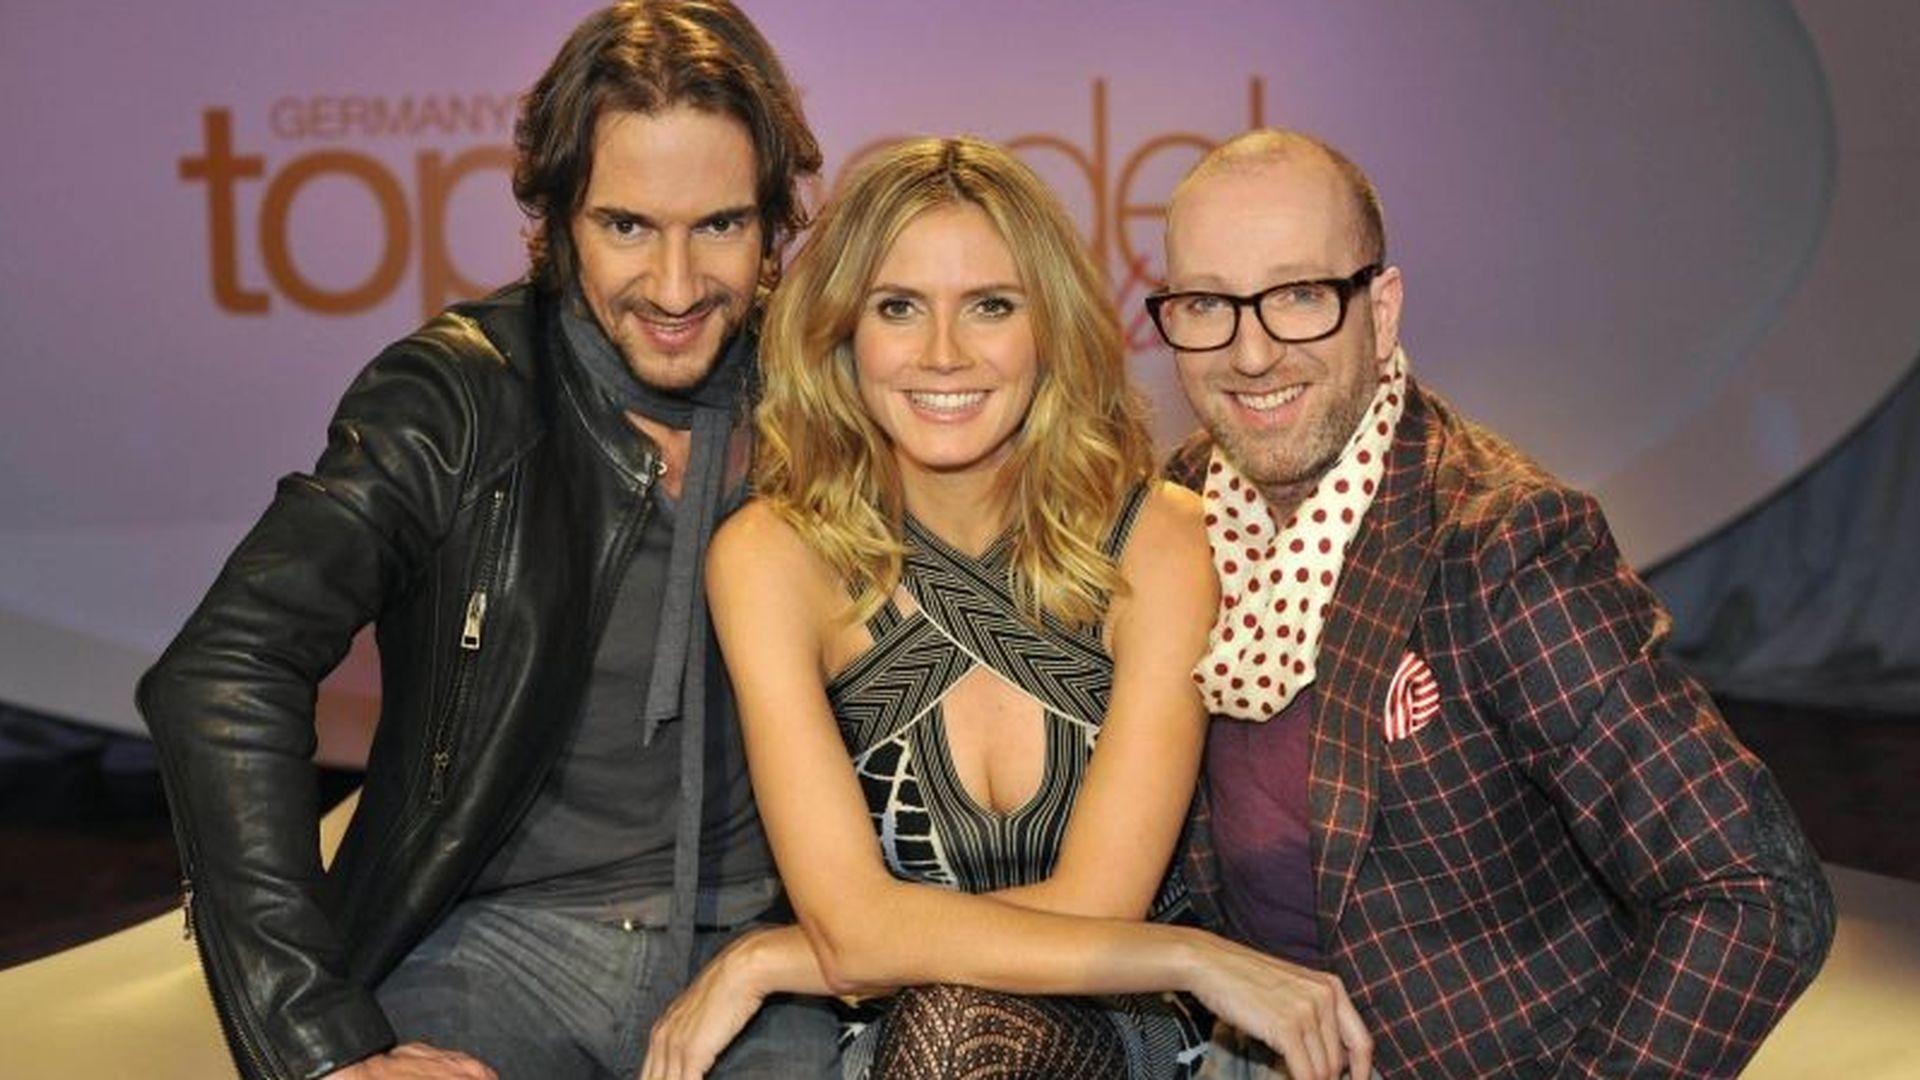 Germany S Next Topmodel Das Ist Die Neue Jury Promiflash De